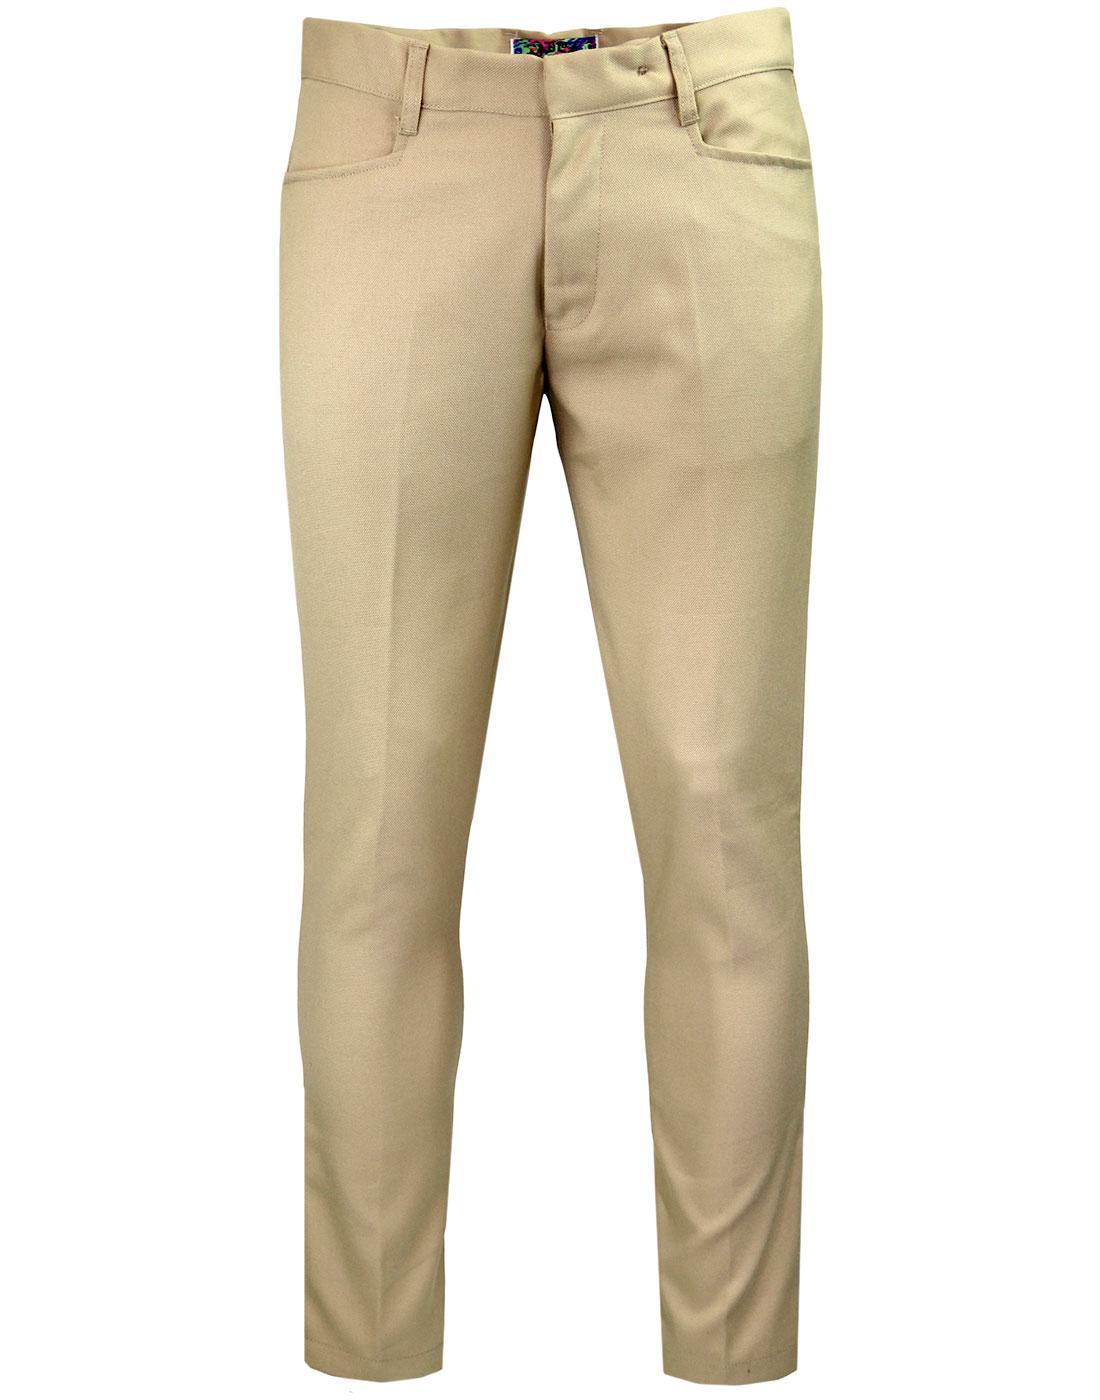 Logan Slim MADCAP ENGLAND Hopsack Trousers STONE